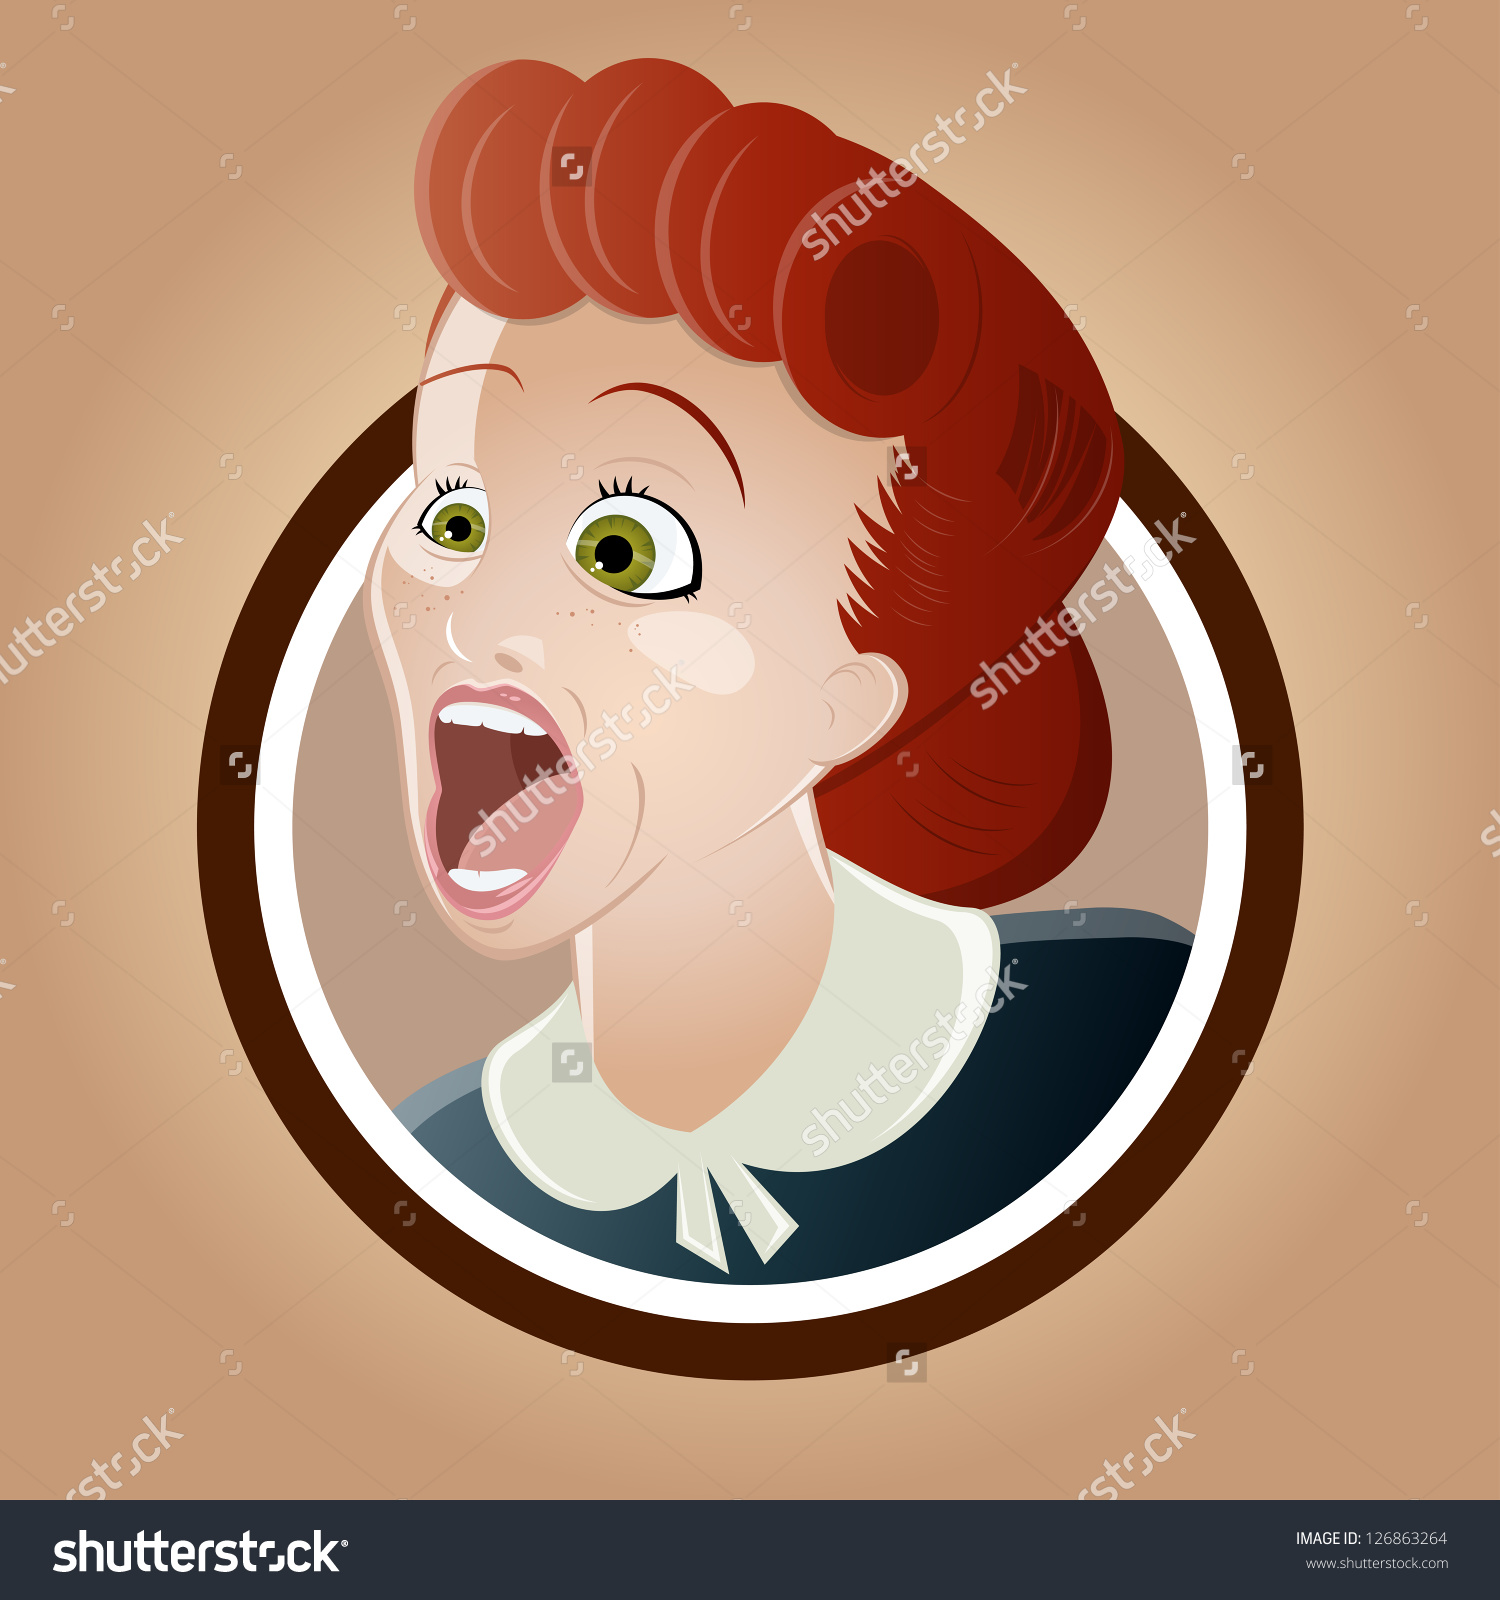 Cartoon Woman Yelling Clipart.